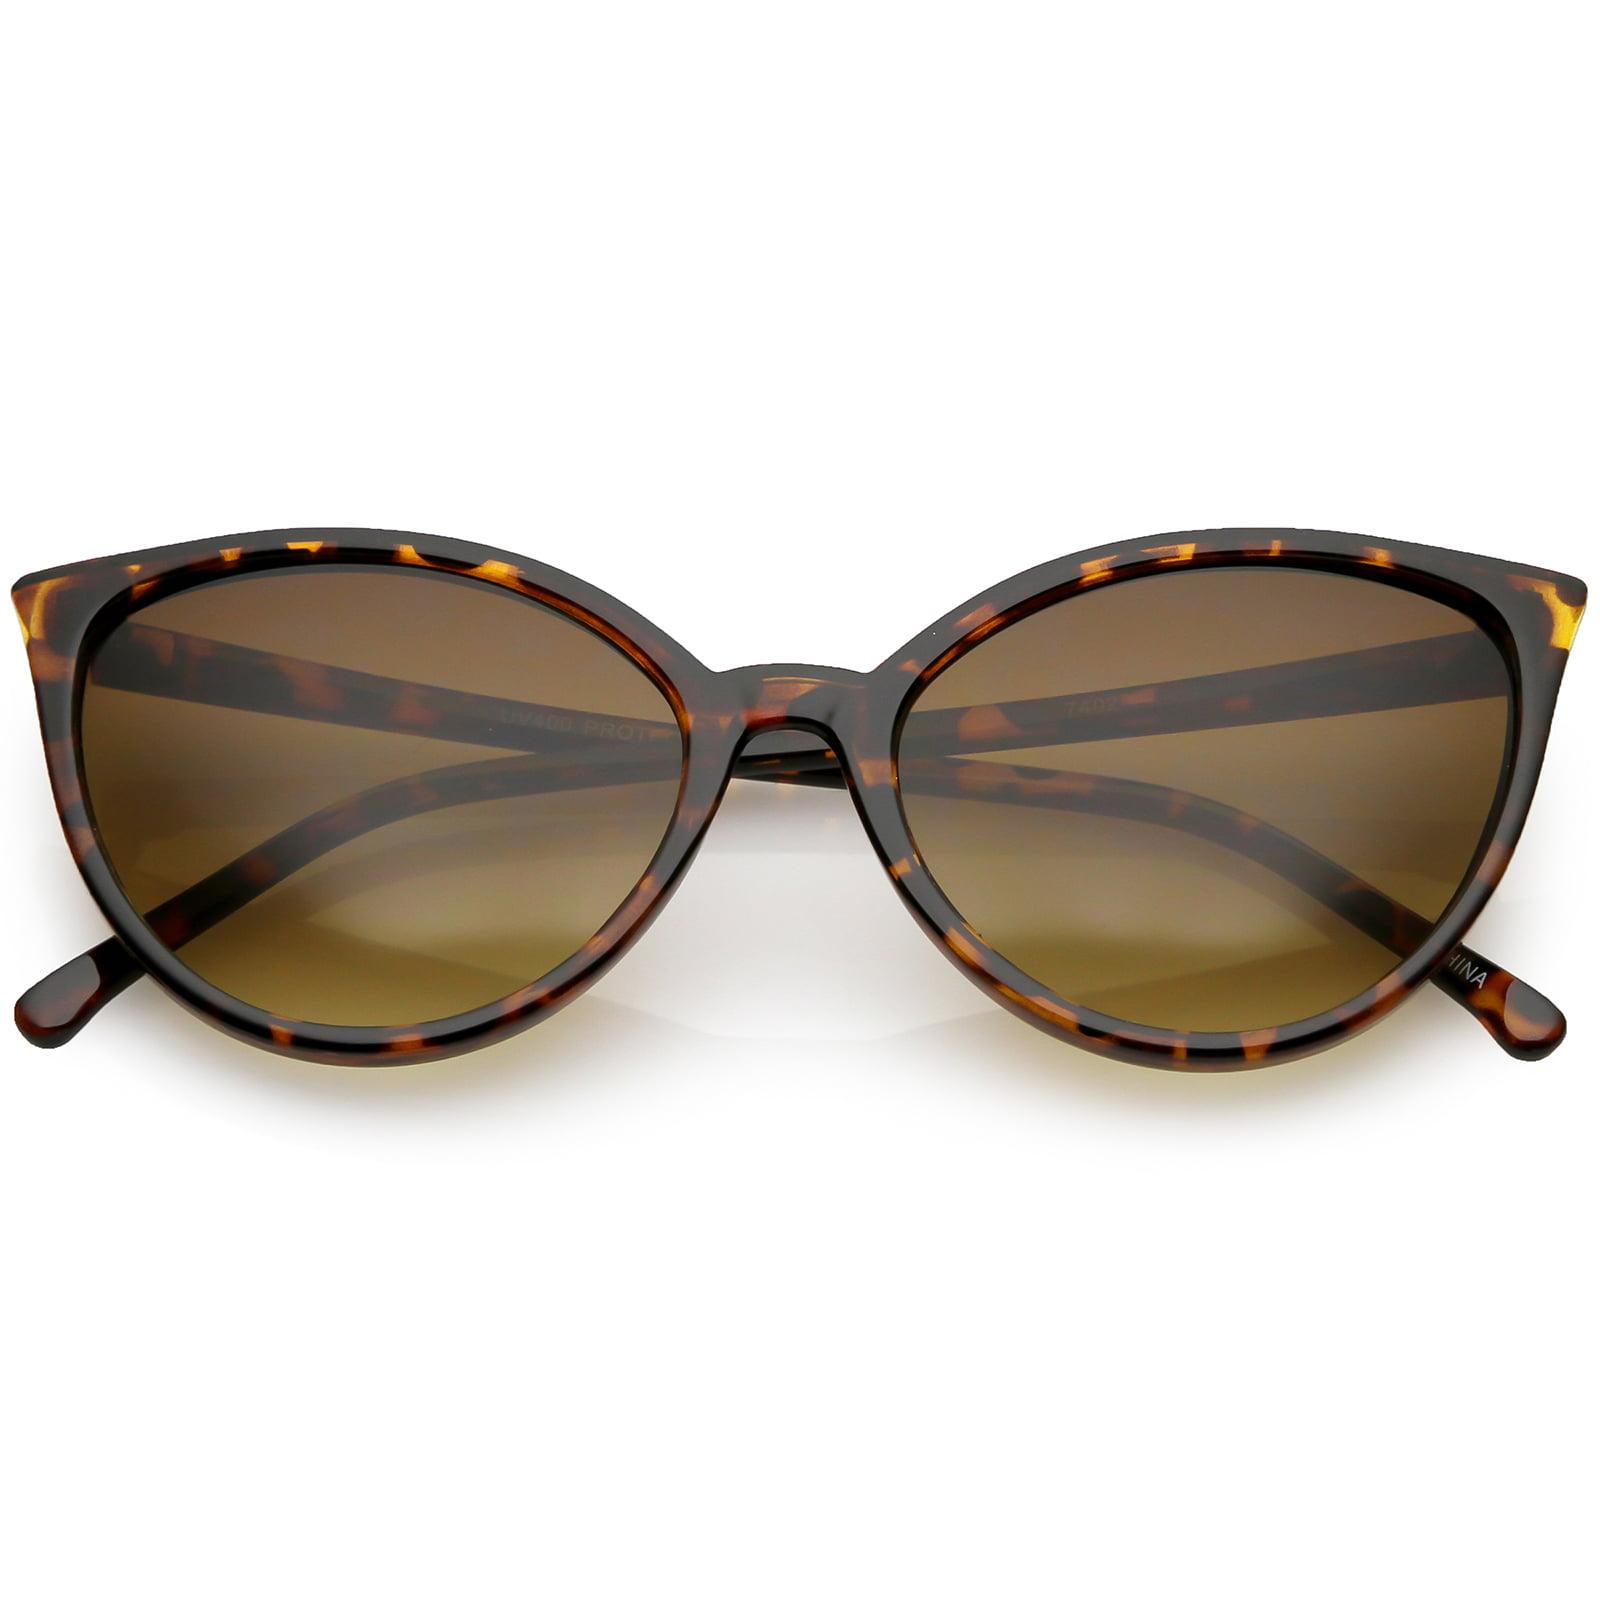 sunglassLA - Unique Cat Eye Sunglasses Slim Frame Round Neutral Colored Gradient Lens 54mm - 54mm